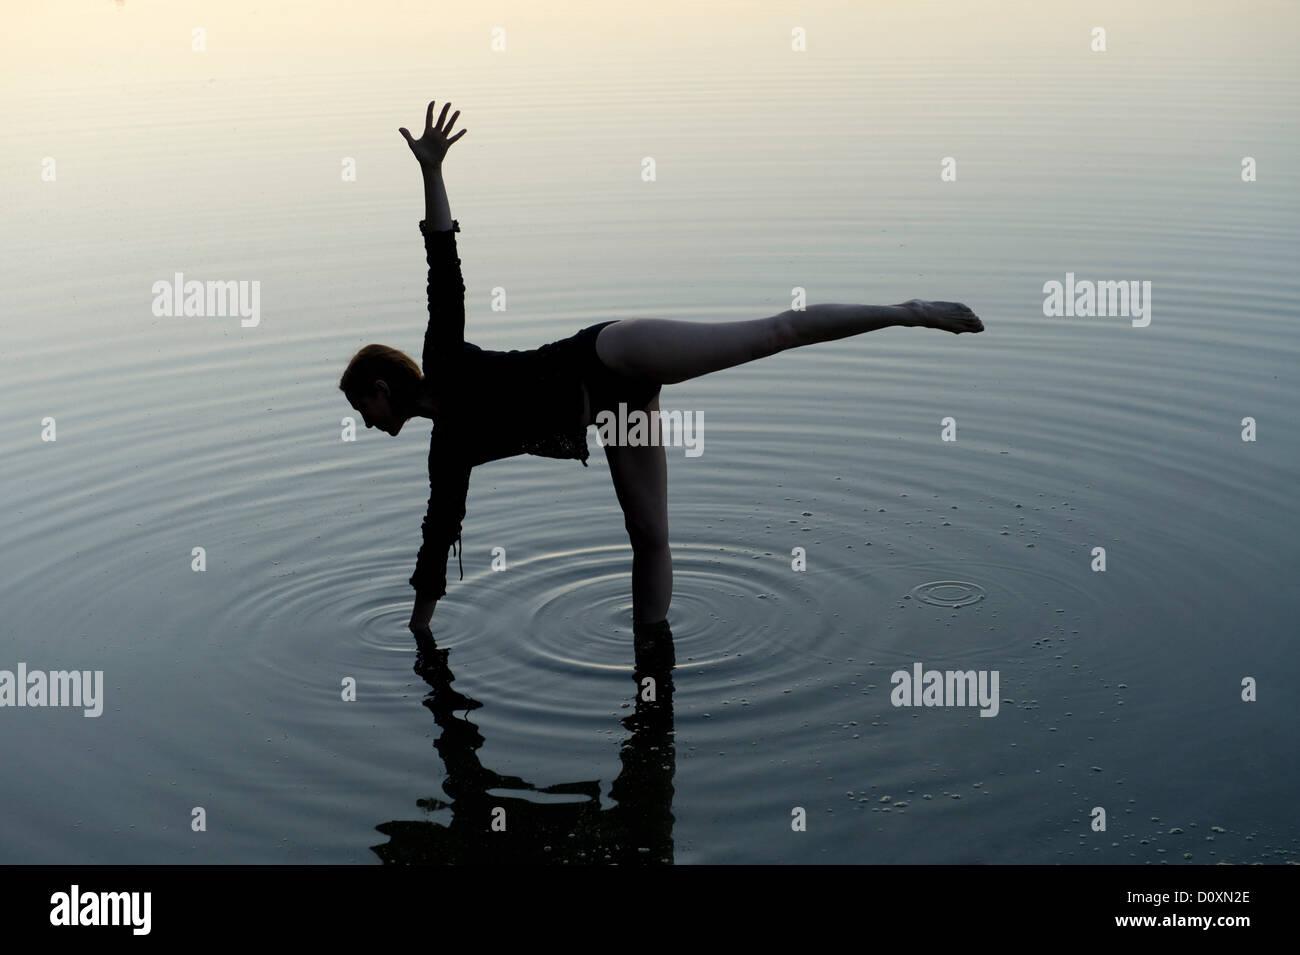 Woman in yoga pose in lake - Stock Image